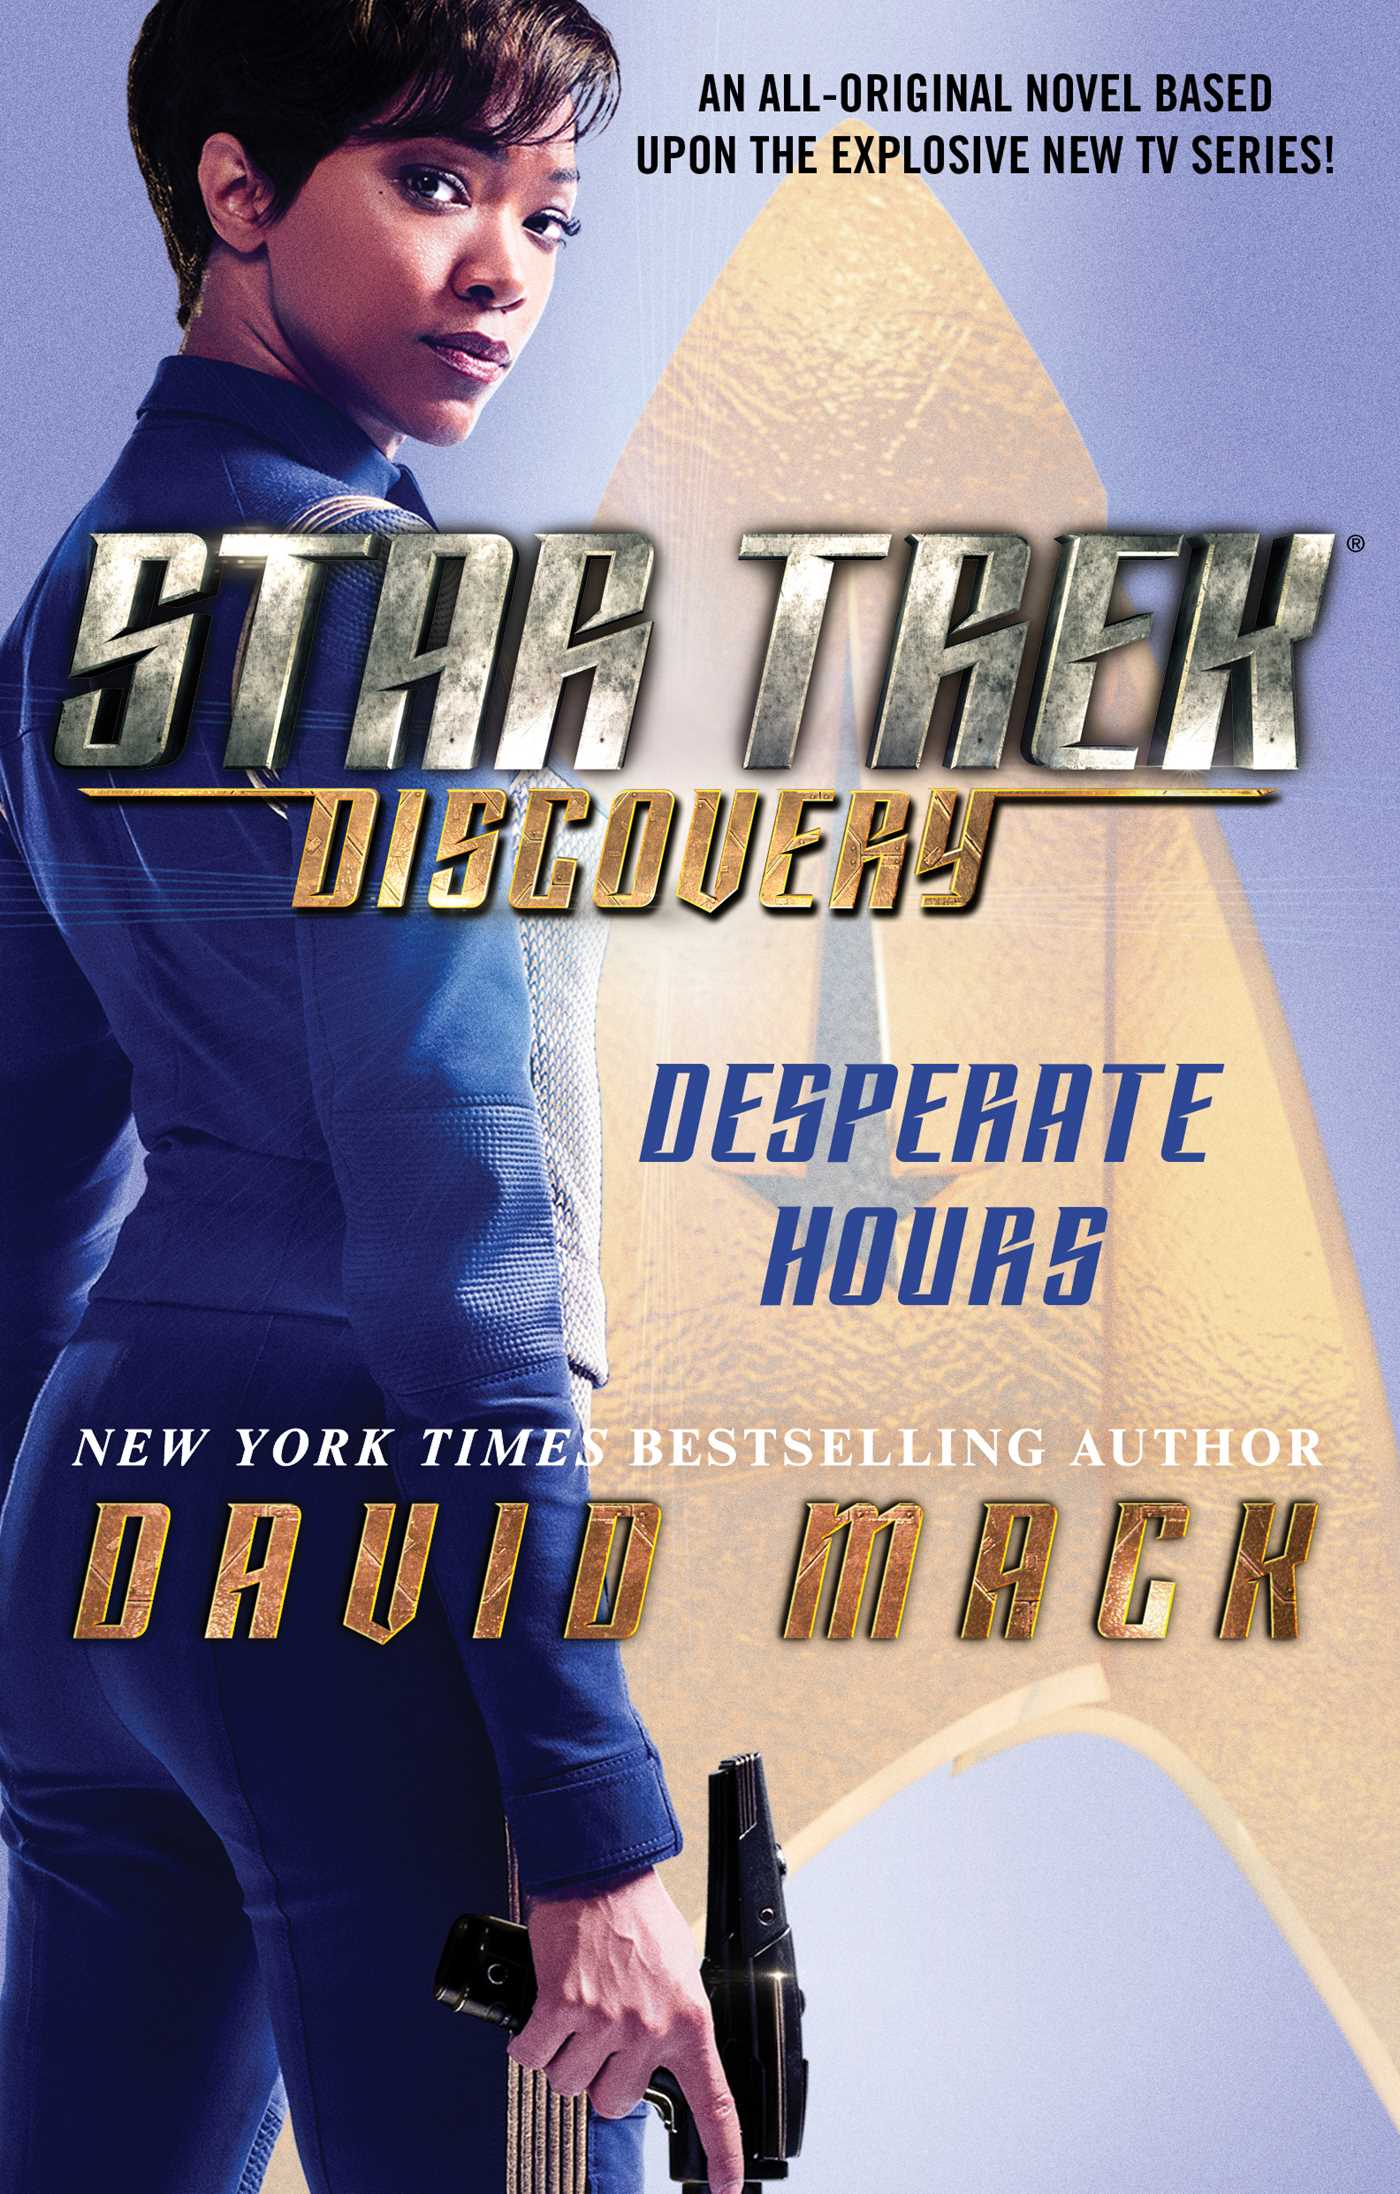 Star trek discovery desperate hours 9781501164576 hr